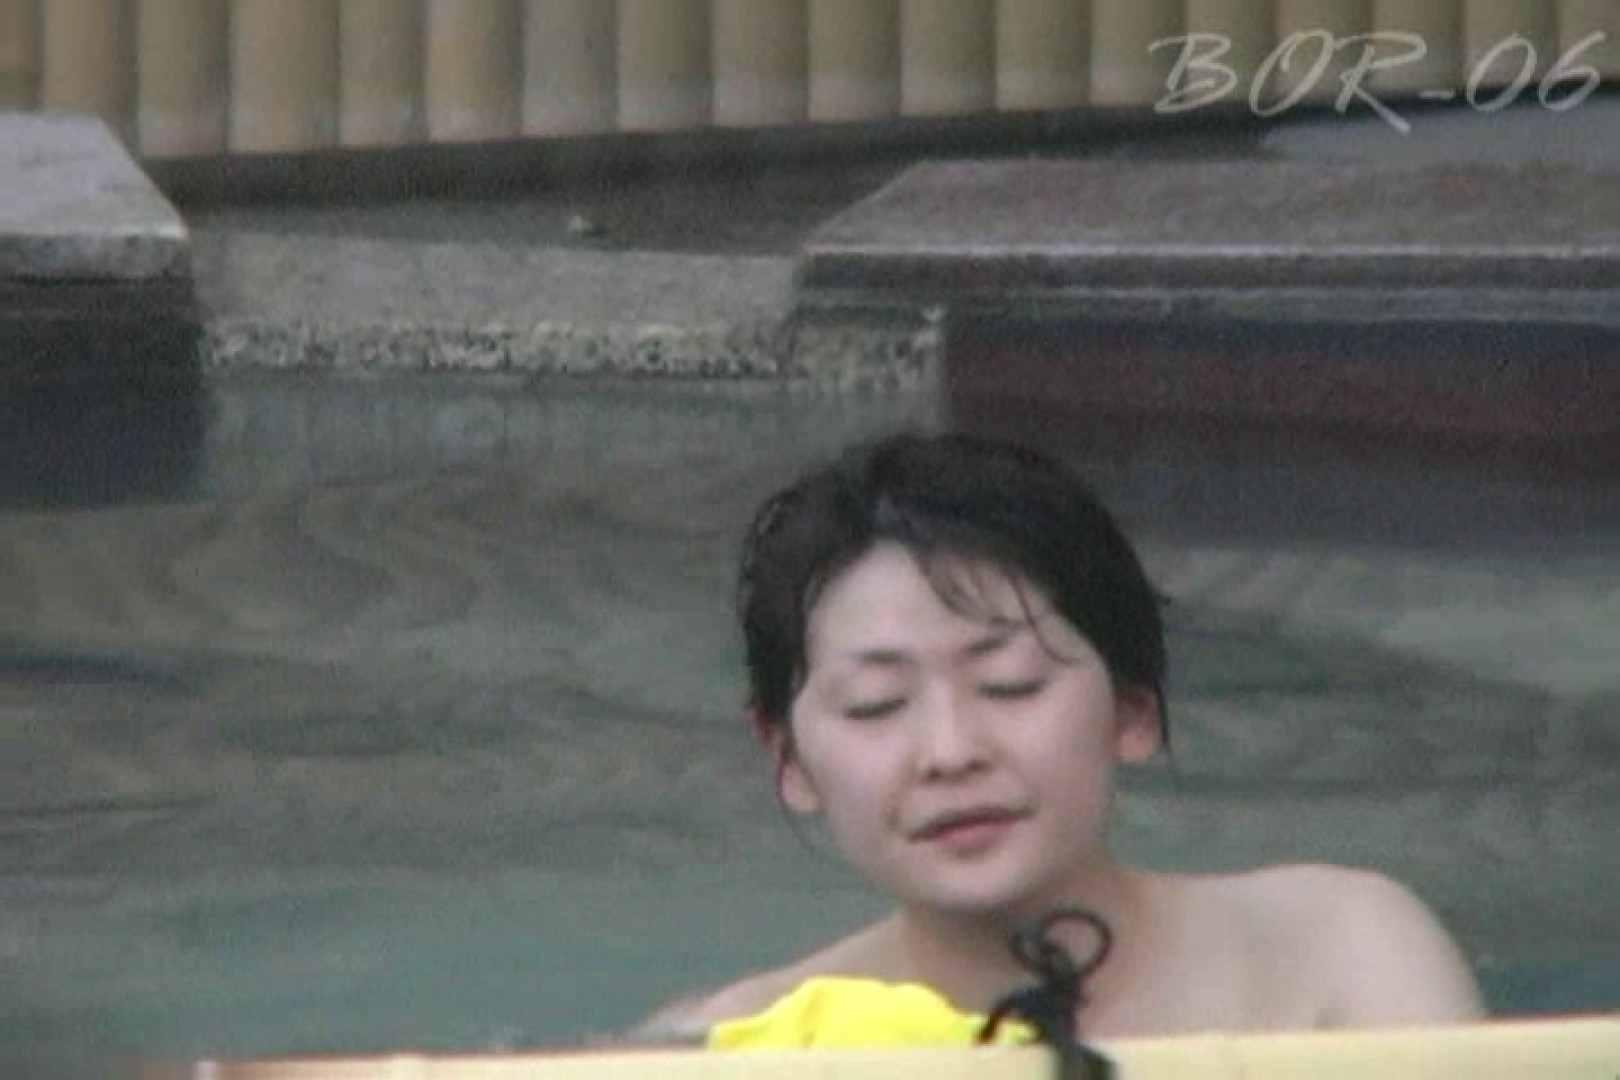 Aquaな露天風呂Vol.523 盗撮映像  93Pix 70